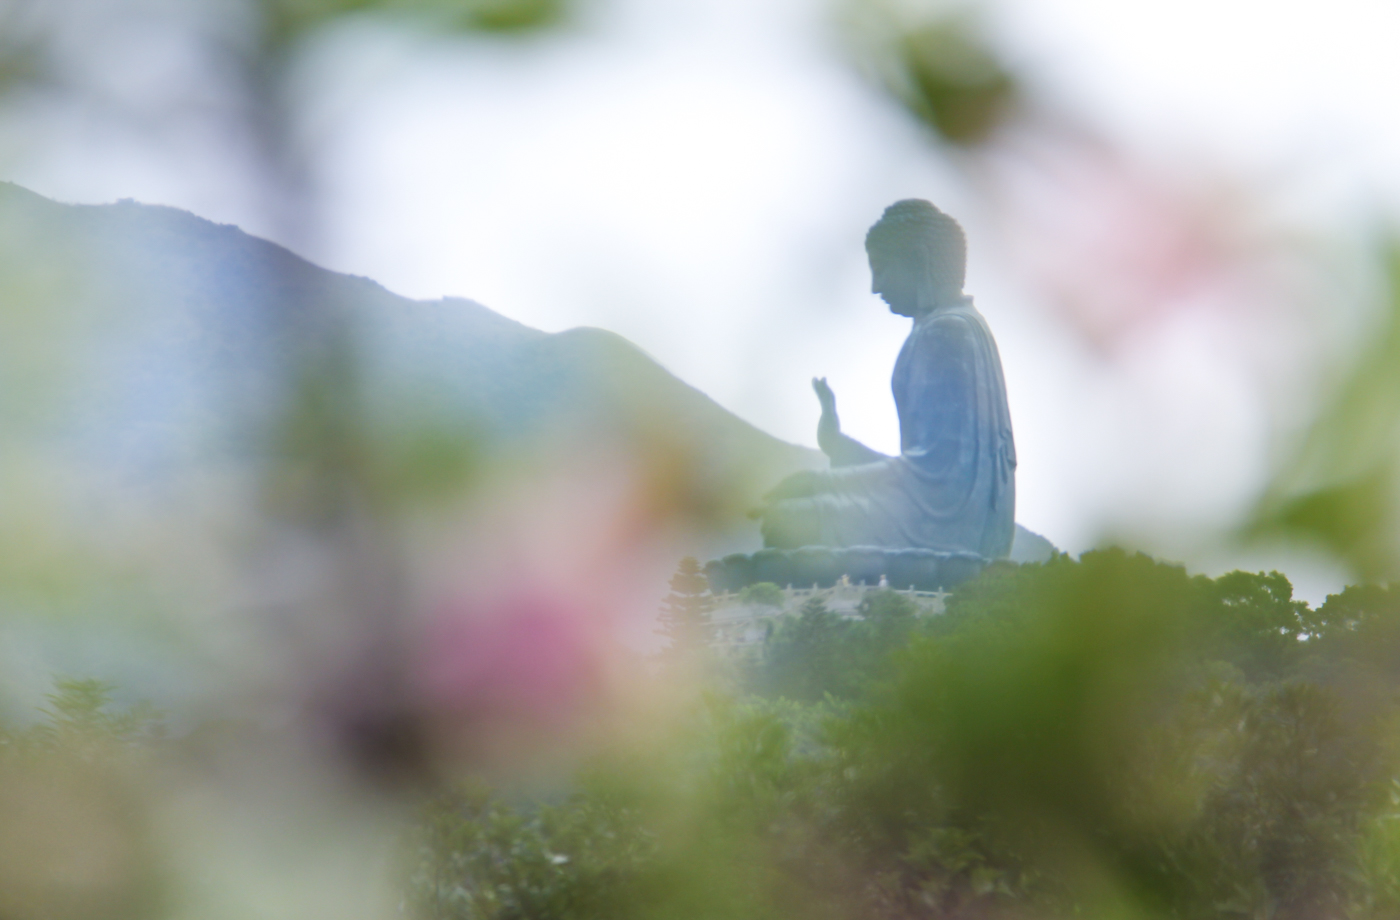 The Tian Tan Buddha on Lantau Island. Photo by DY